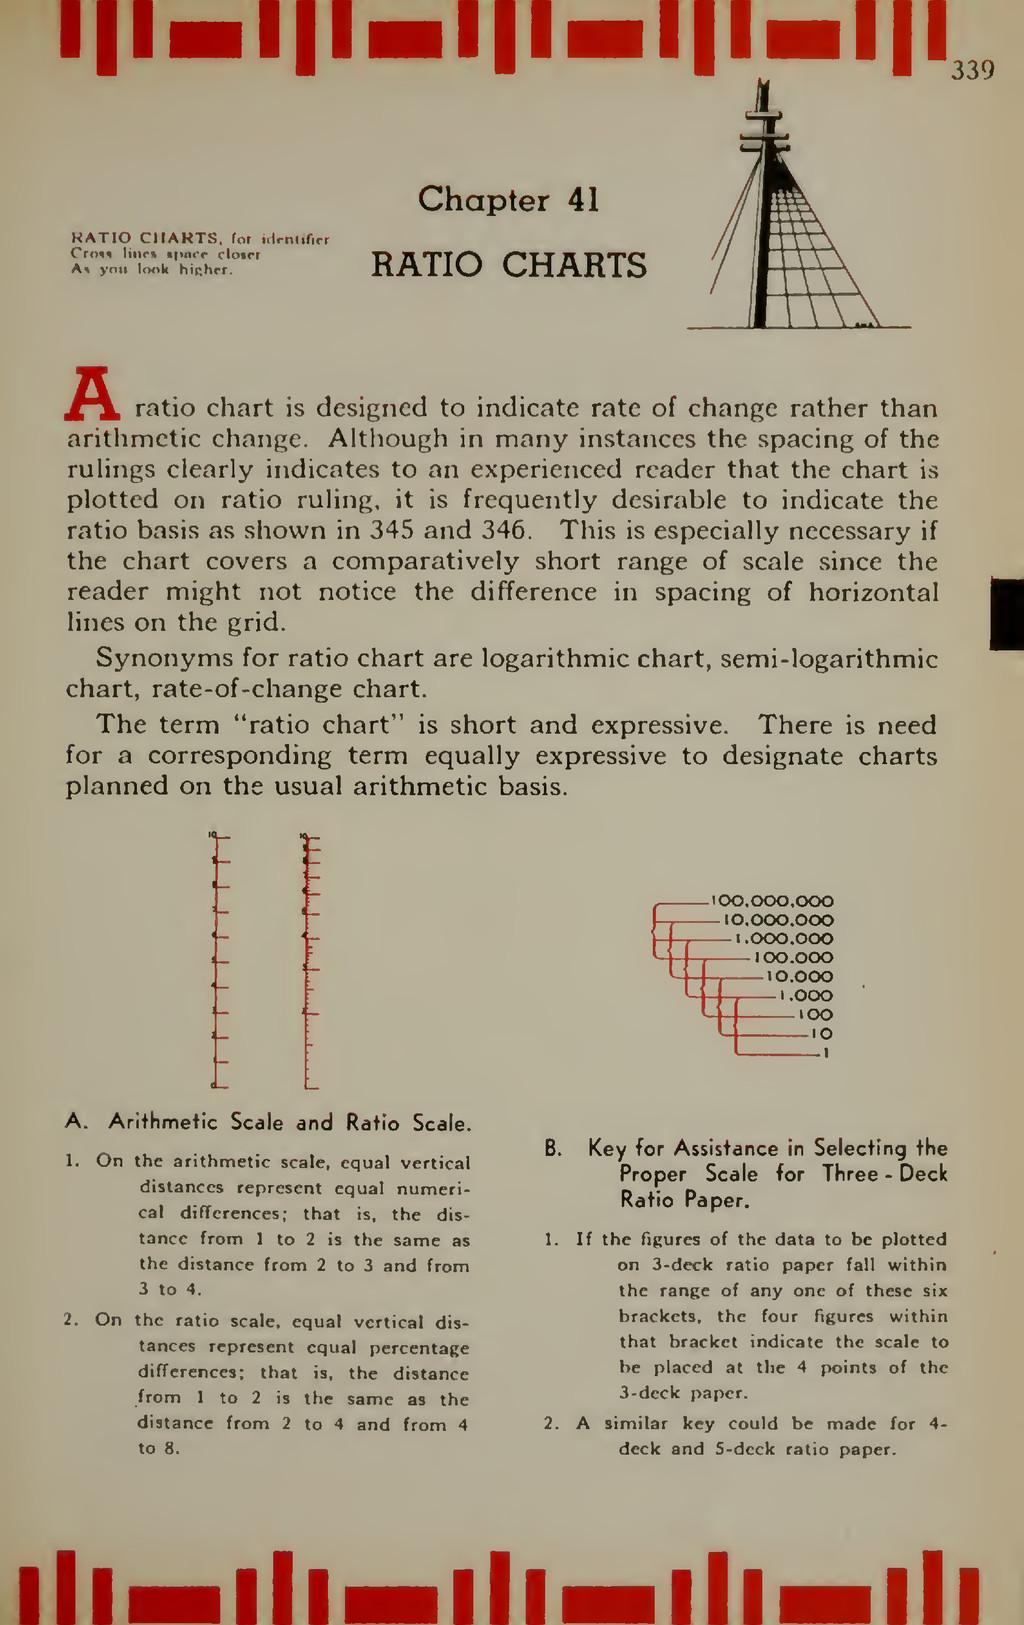 RATIO CHARTS, for idrnlifirr Cro«« lmr« i|>iii-...